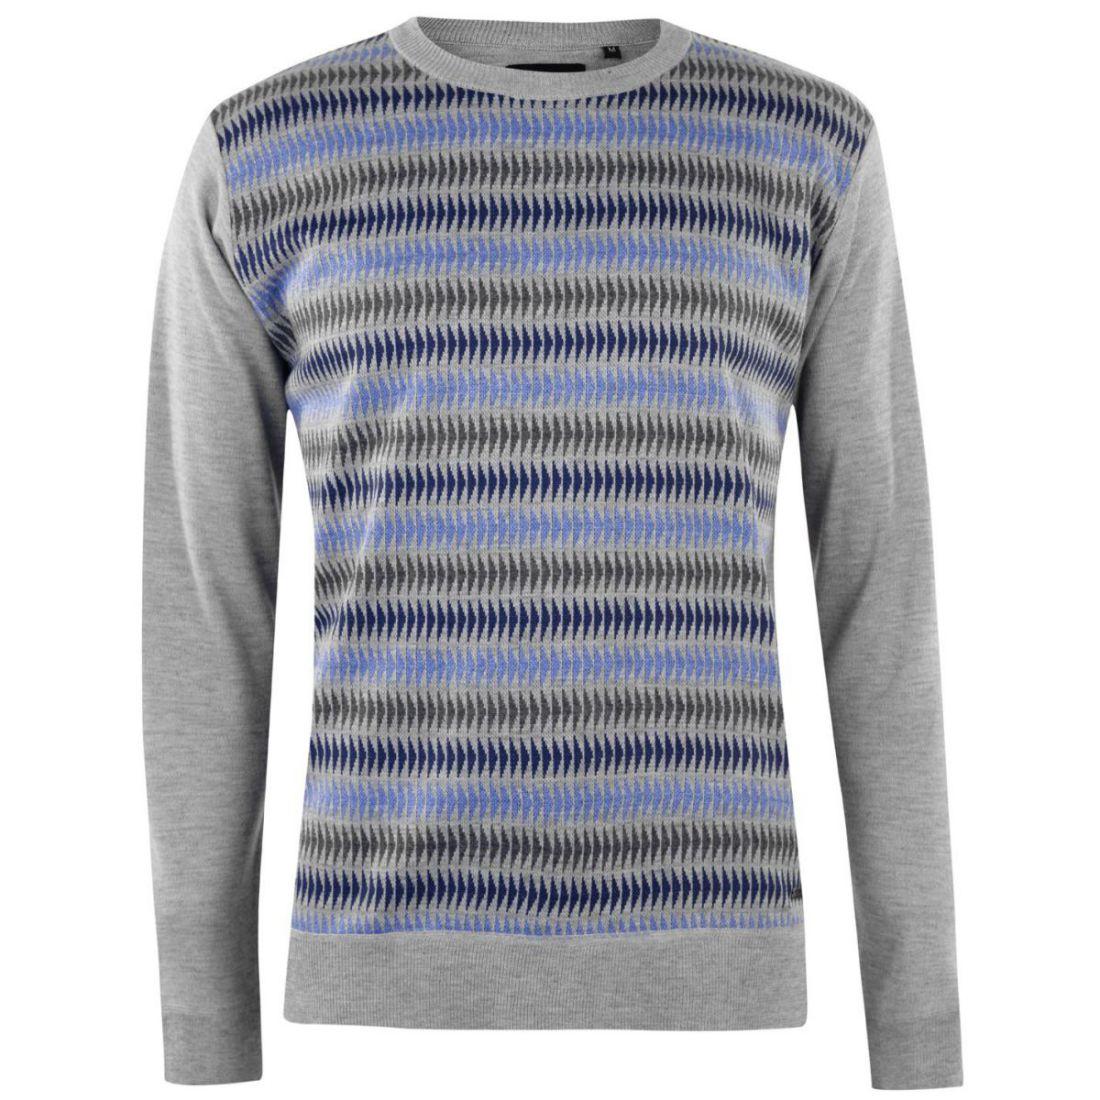 dc12c22478b18c Pierre Cardin Mens Geo Knit Jumper Sweater Pullover Long Sleeve Crew ...